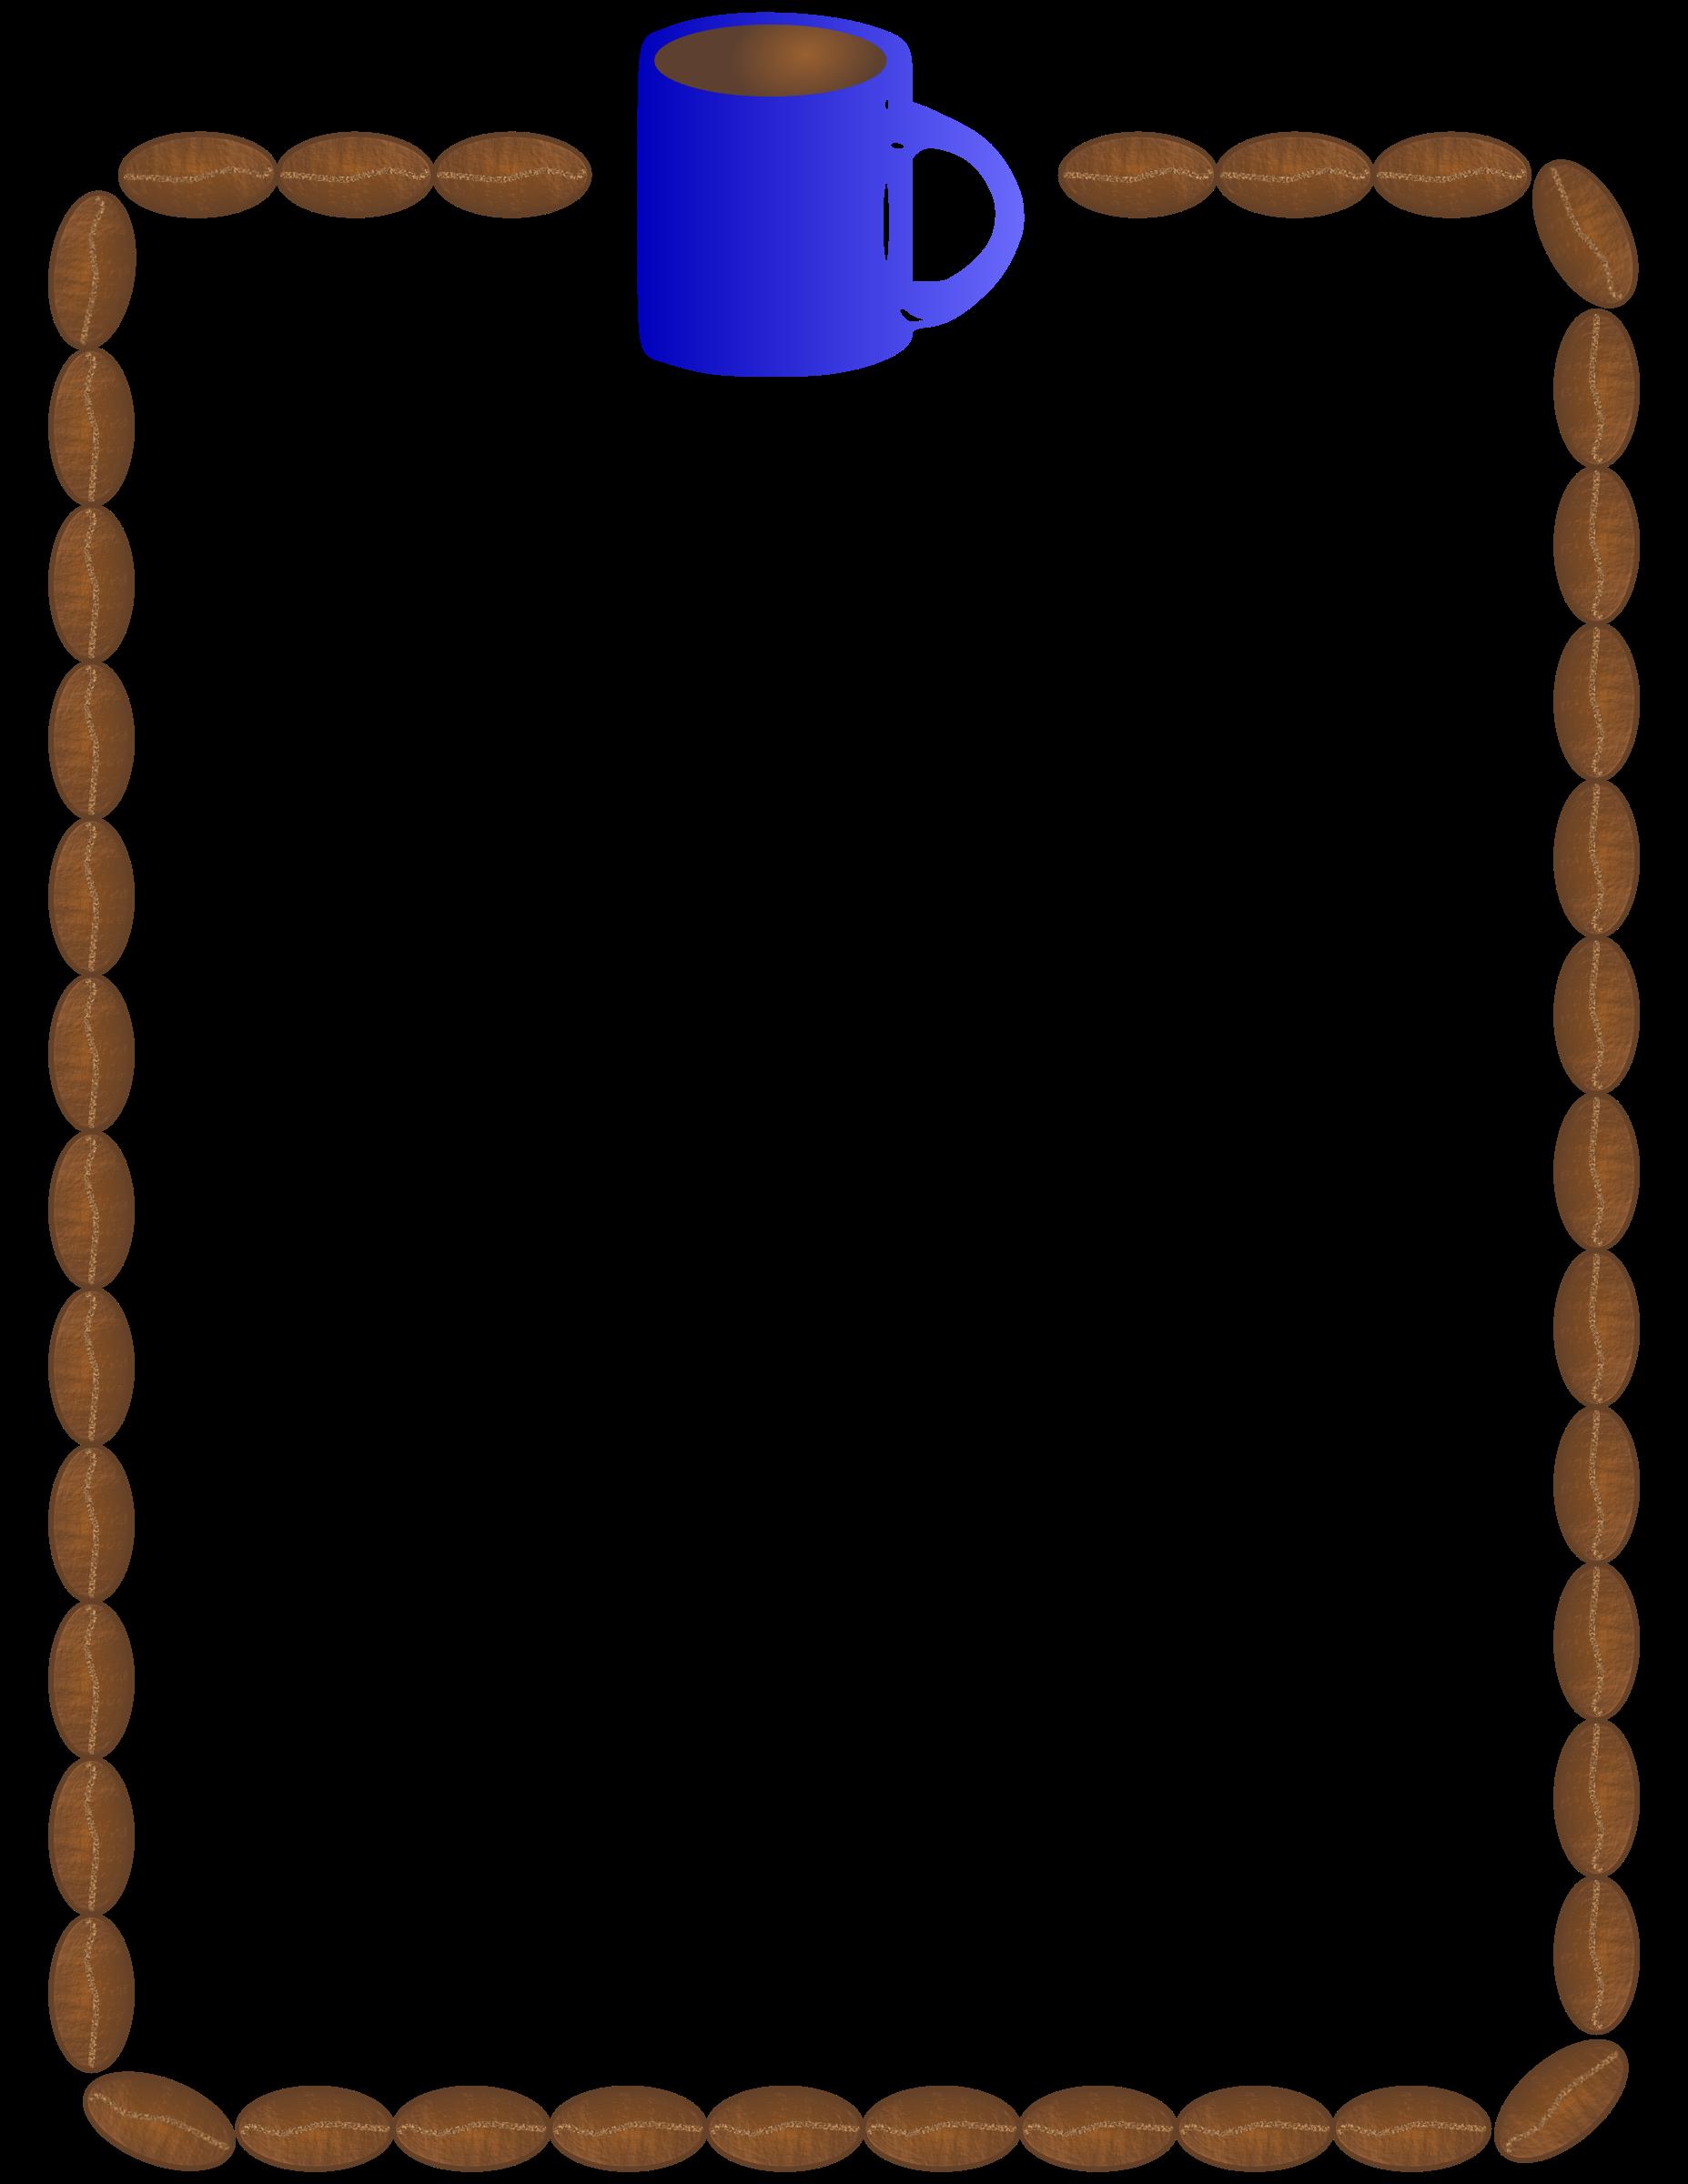 Trendy pumpkin clipart border clip art freeuse Coffee | Clip Art | Pinterest | Coffee and Beans clip art freeuse